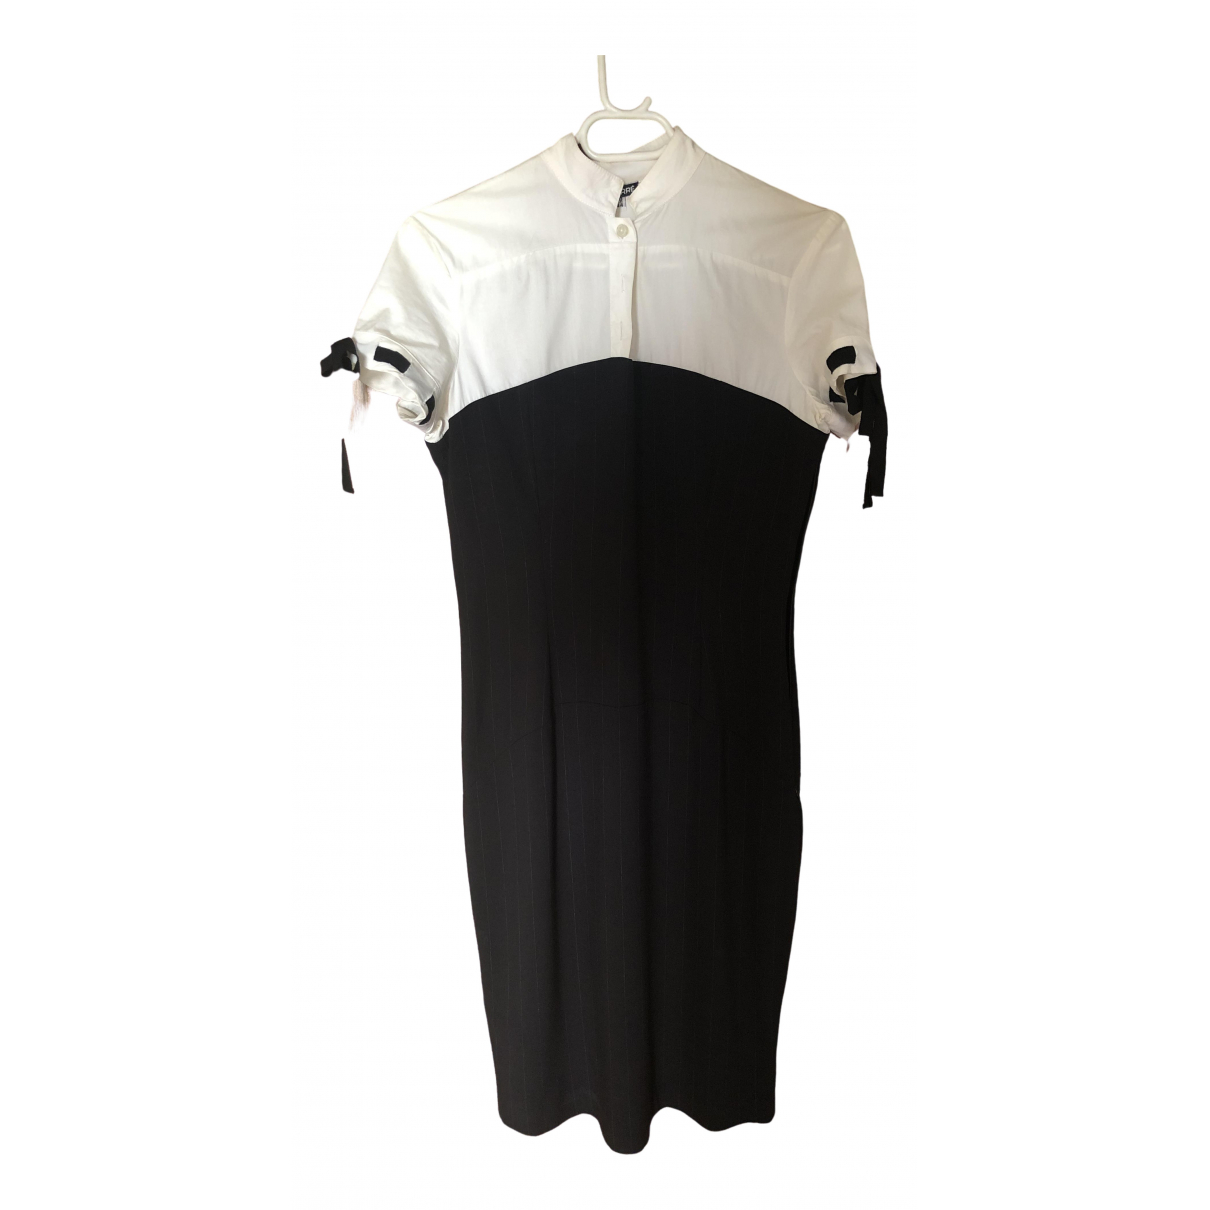 Gianfranco Ferre \N Kleid in  Schwarz Baumwolle